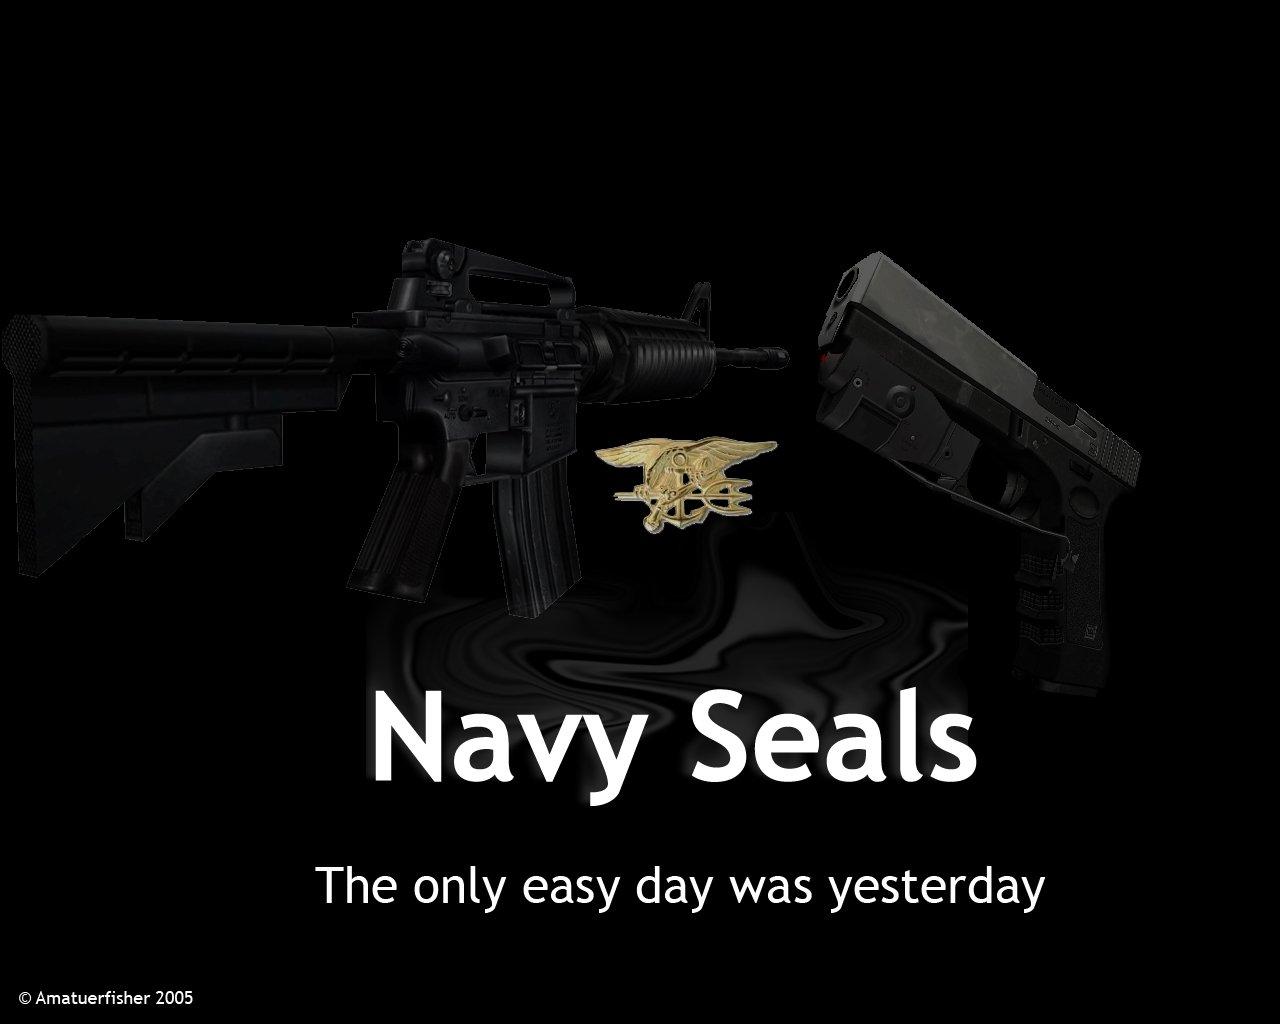 Navy Seal Wallpaper 5   1280 X 1024 stmednet 1280x1024